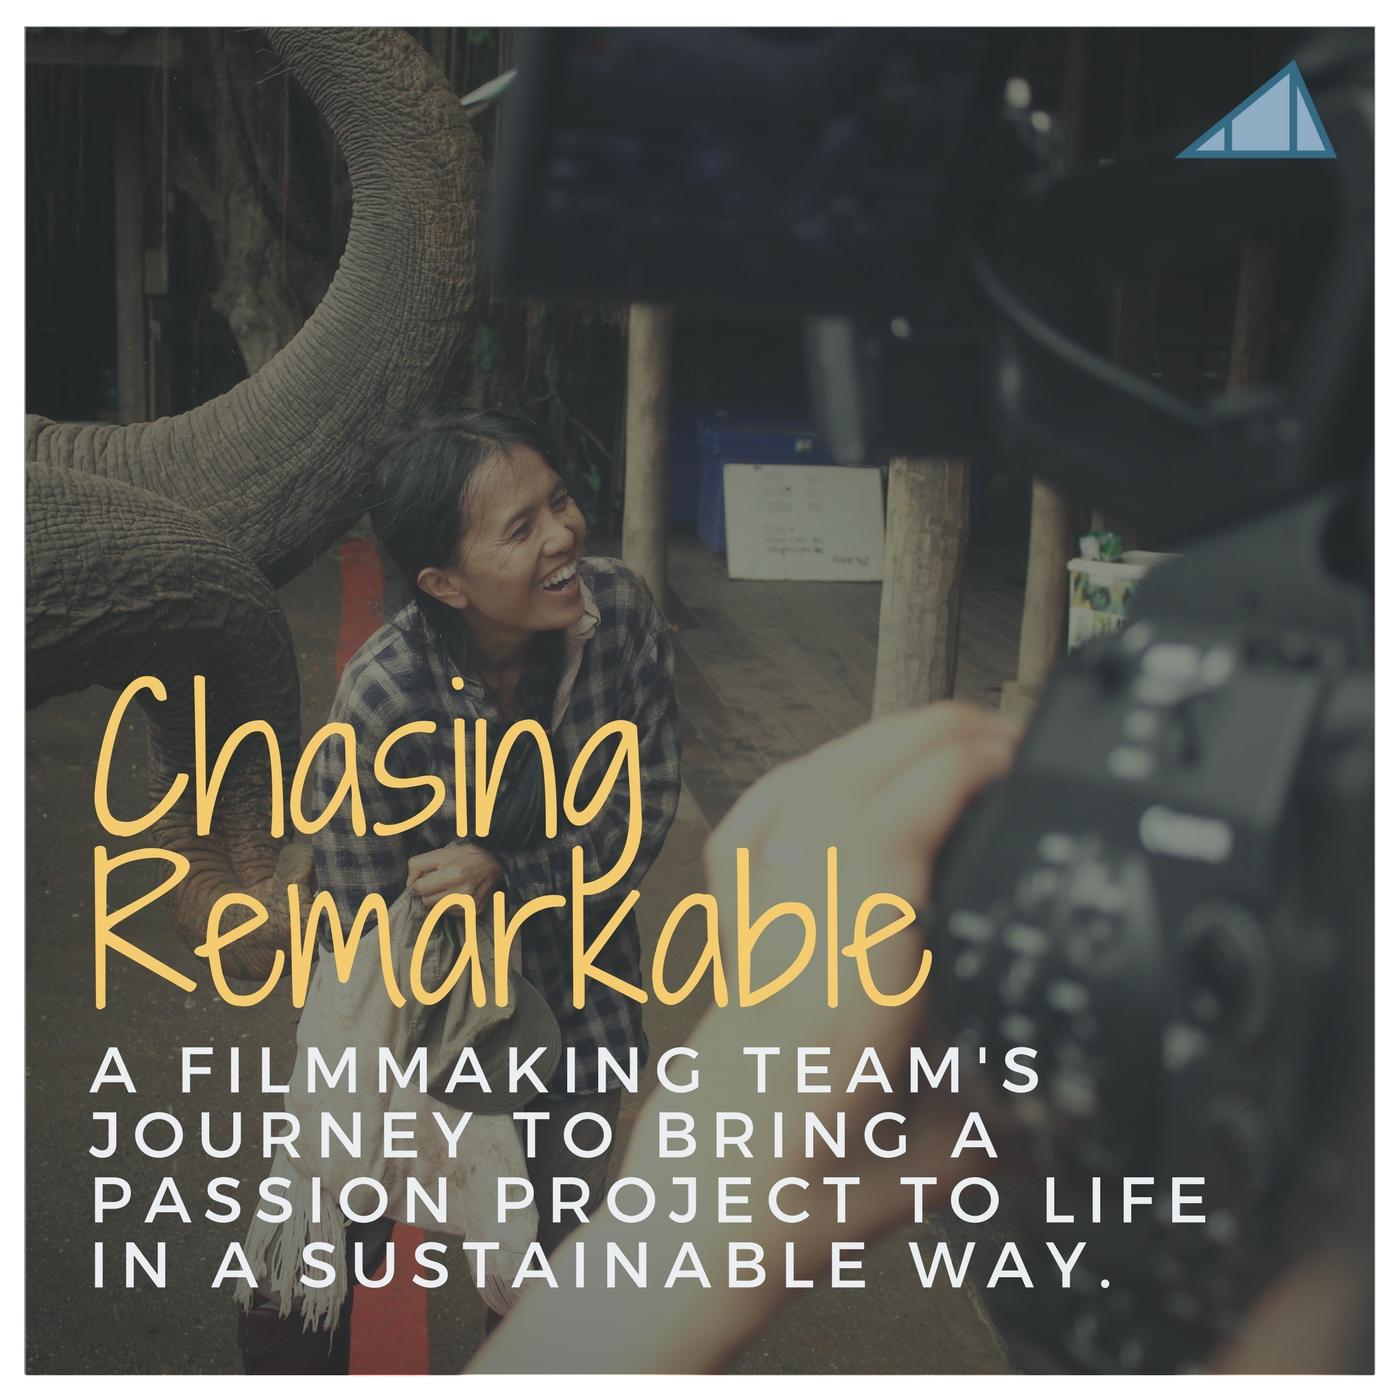 Chasing Remarkable Podcast.jpg